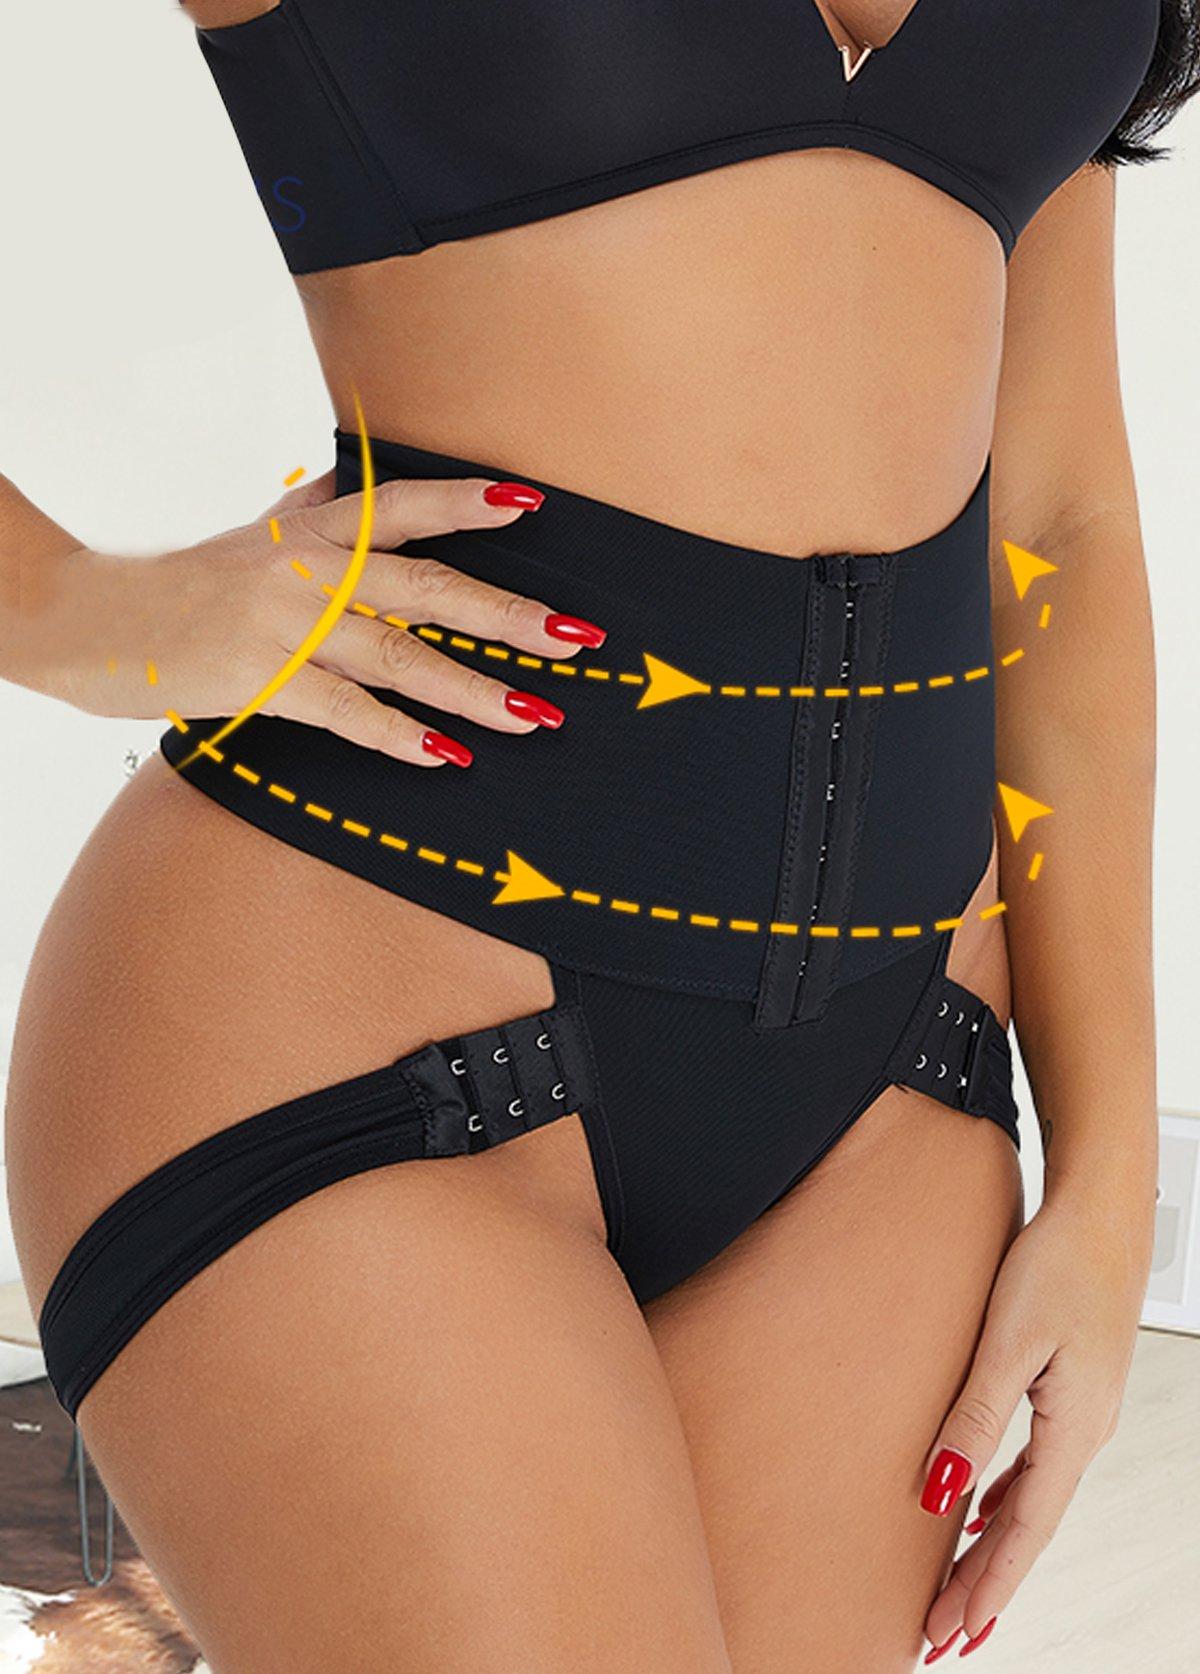 Solid Skinny High Waist Panties for Women